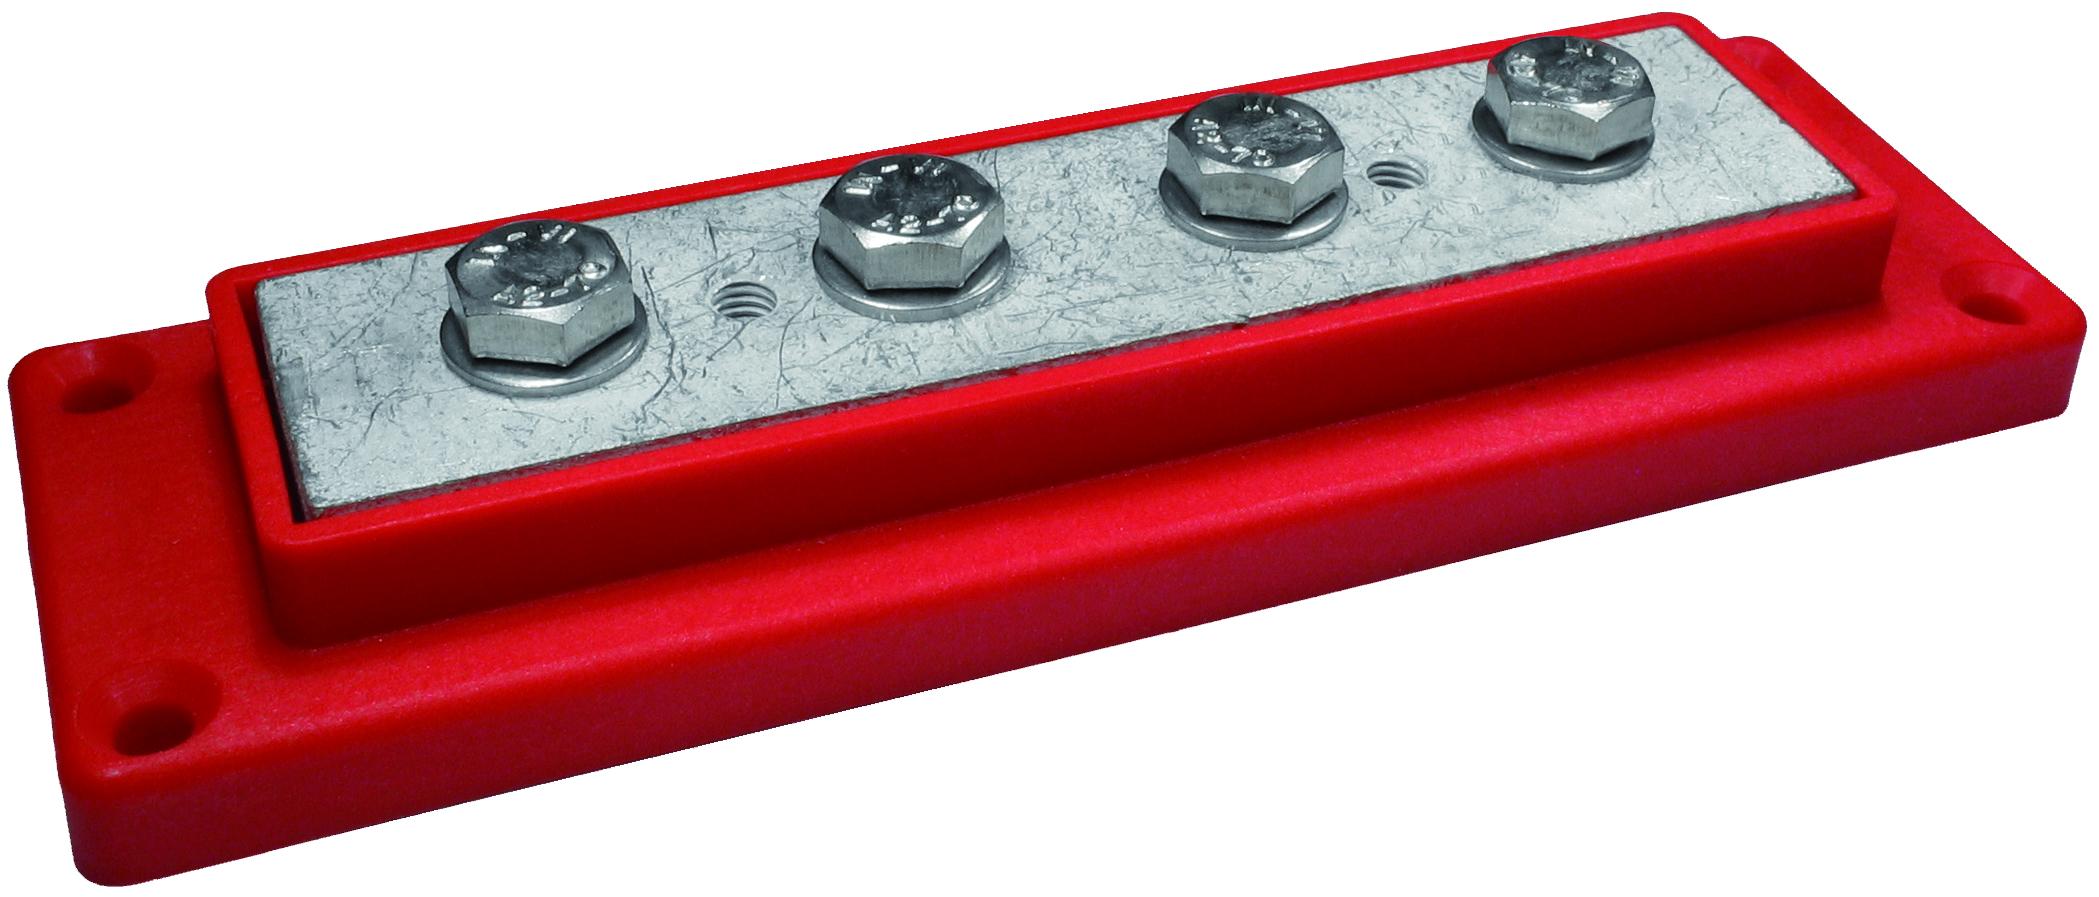 Kopplingsplint röd 4 x 120 mm² m8